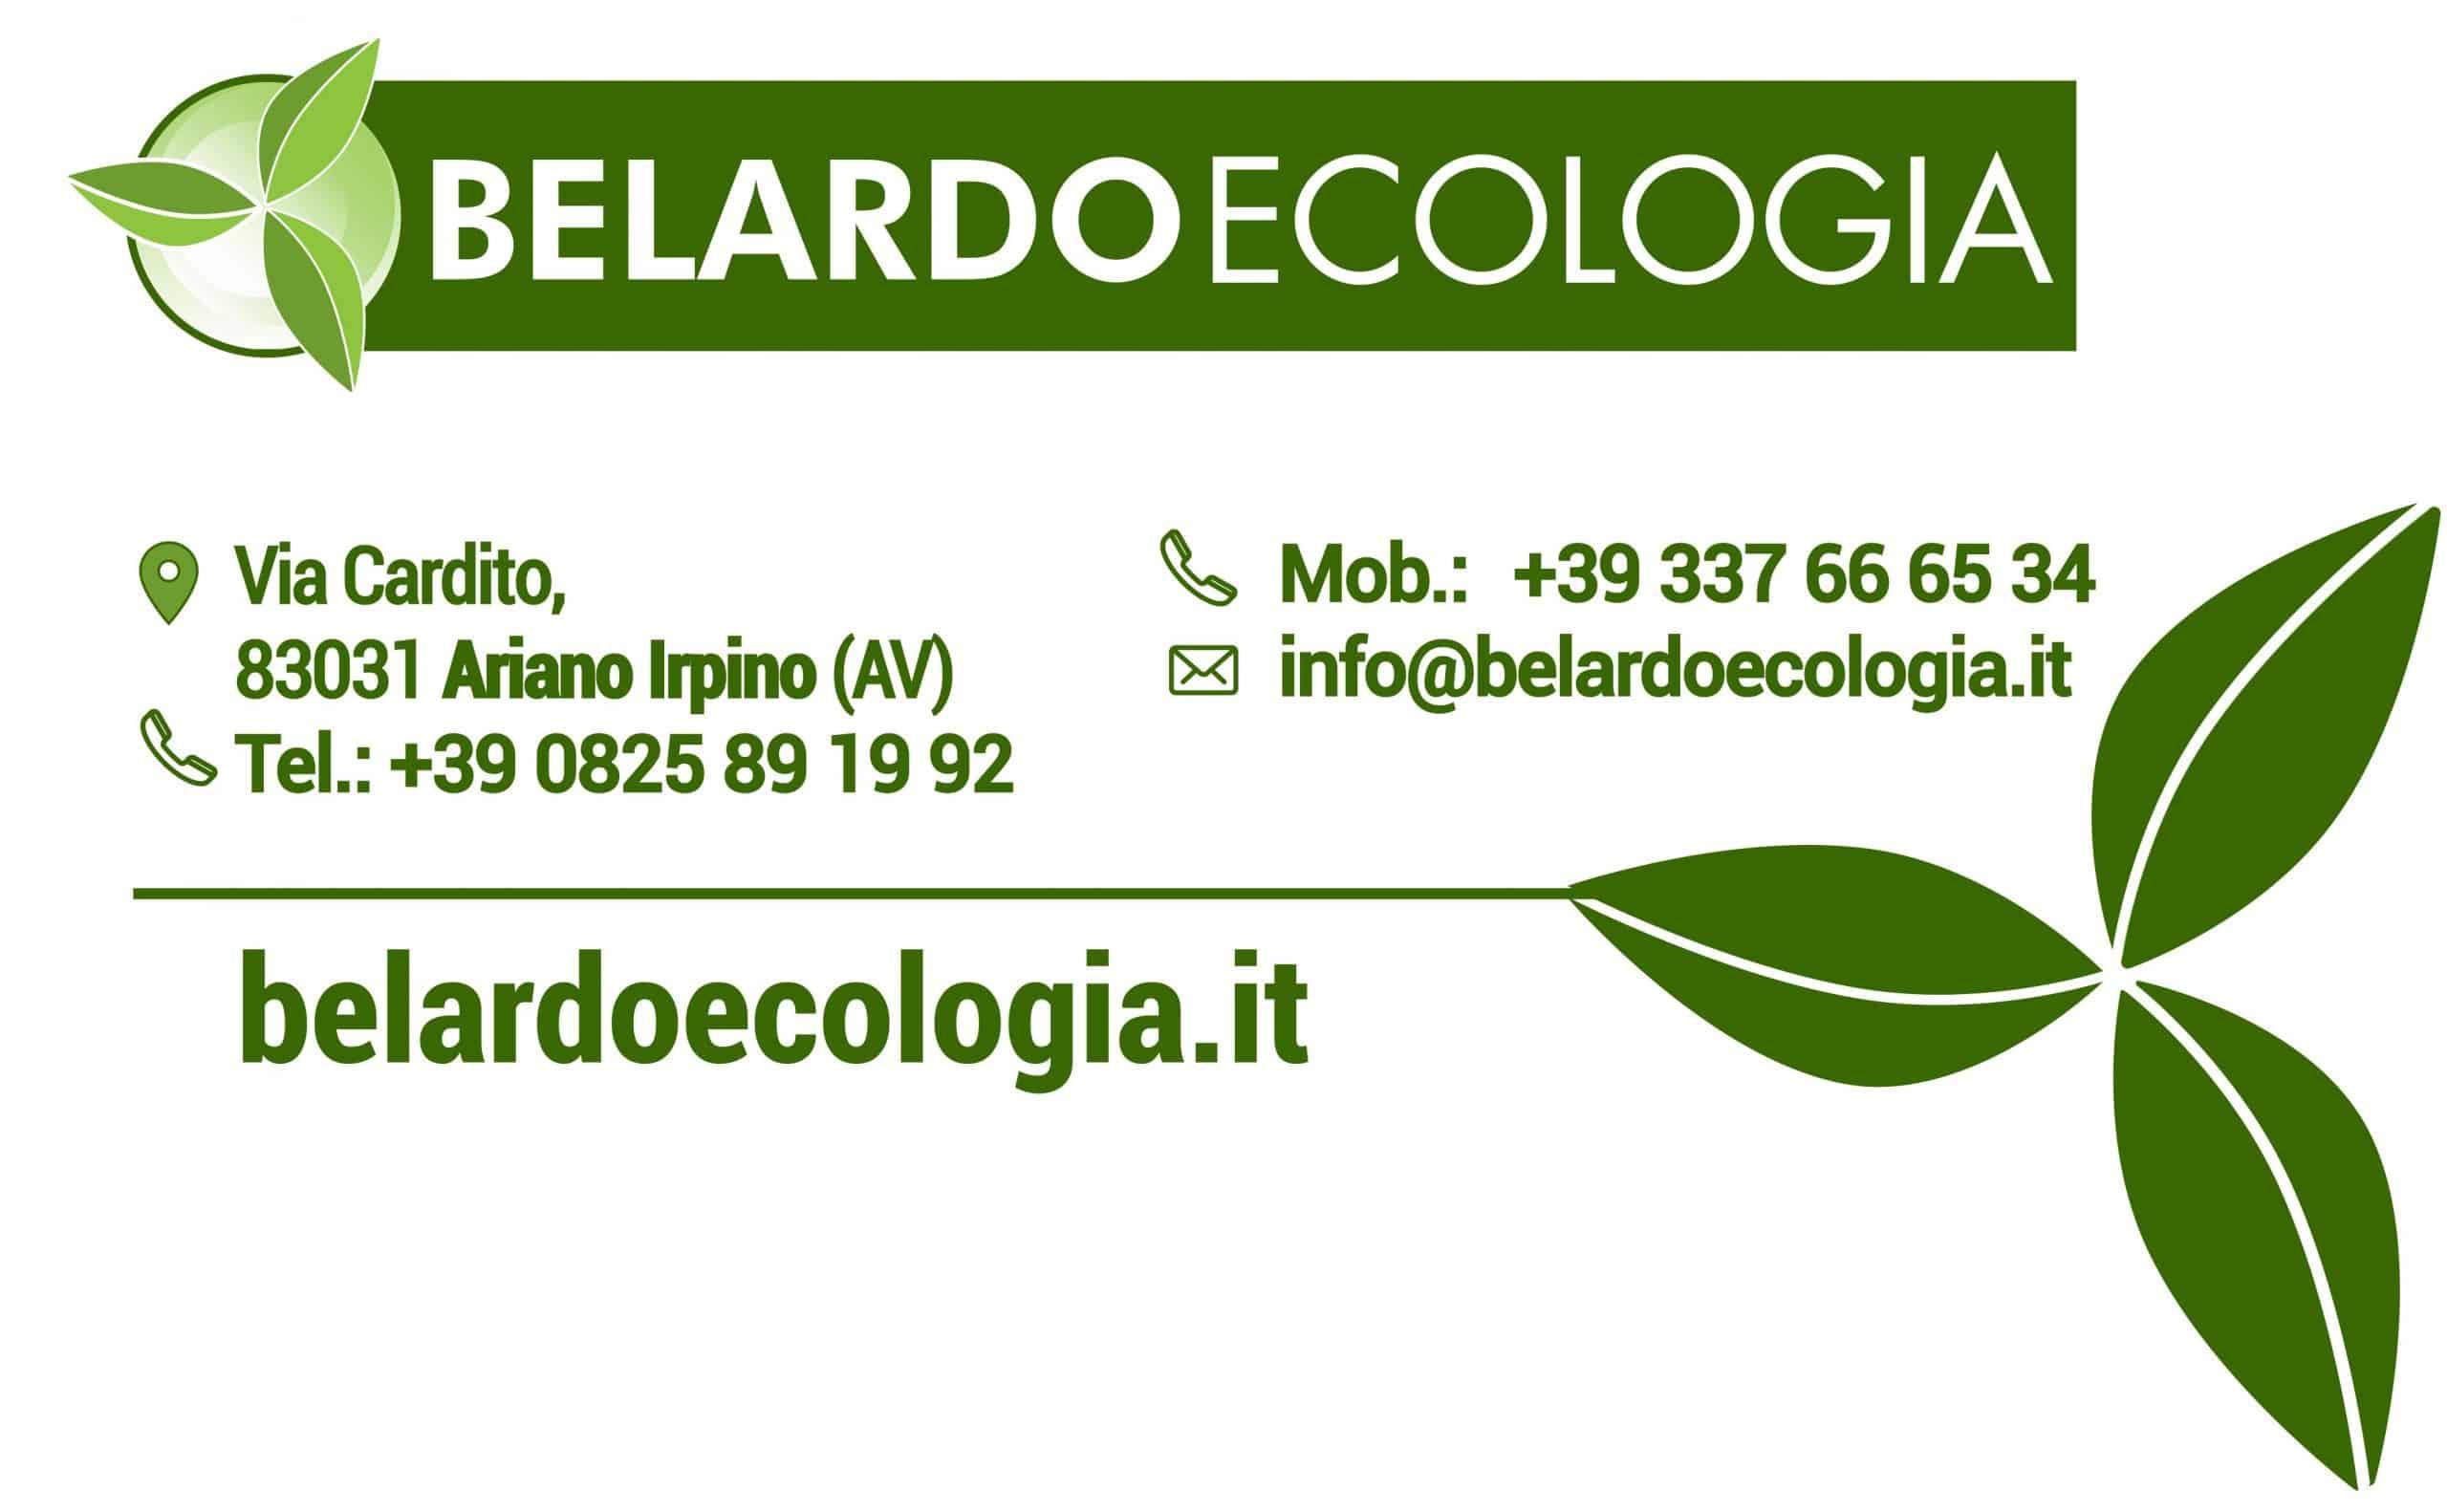 Belardo Ecologia